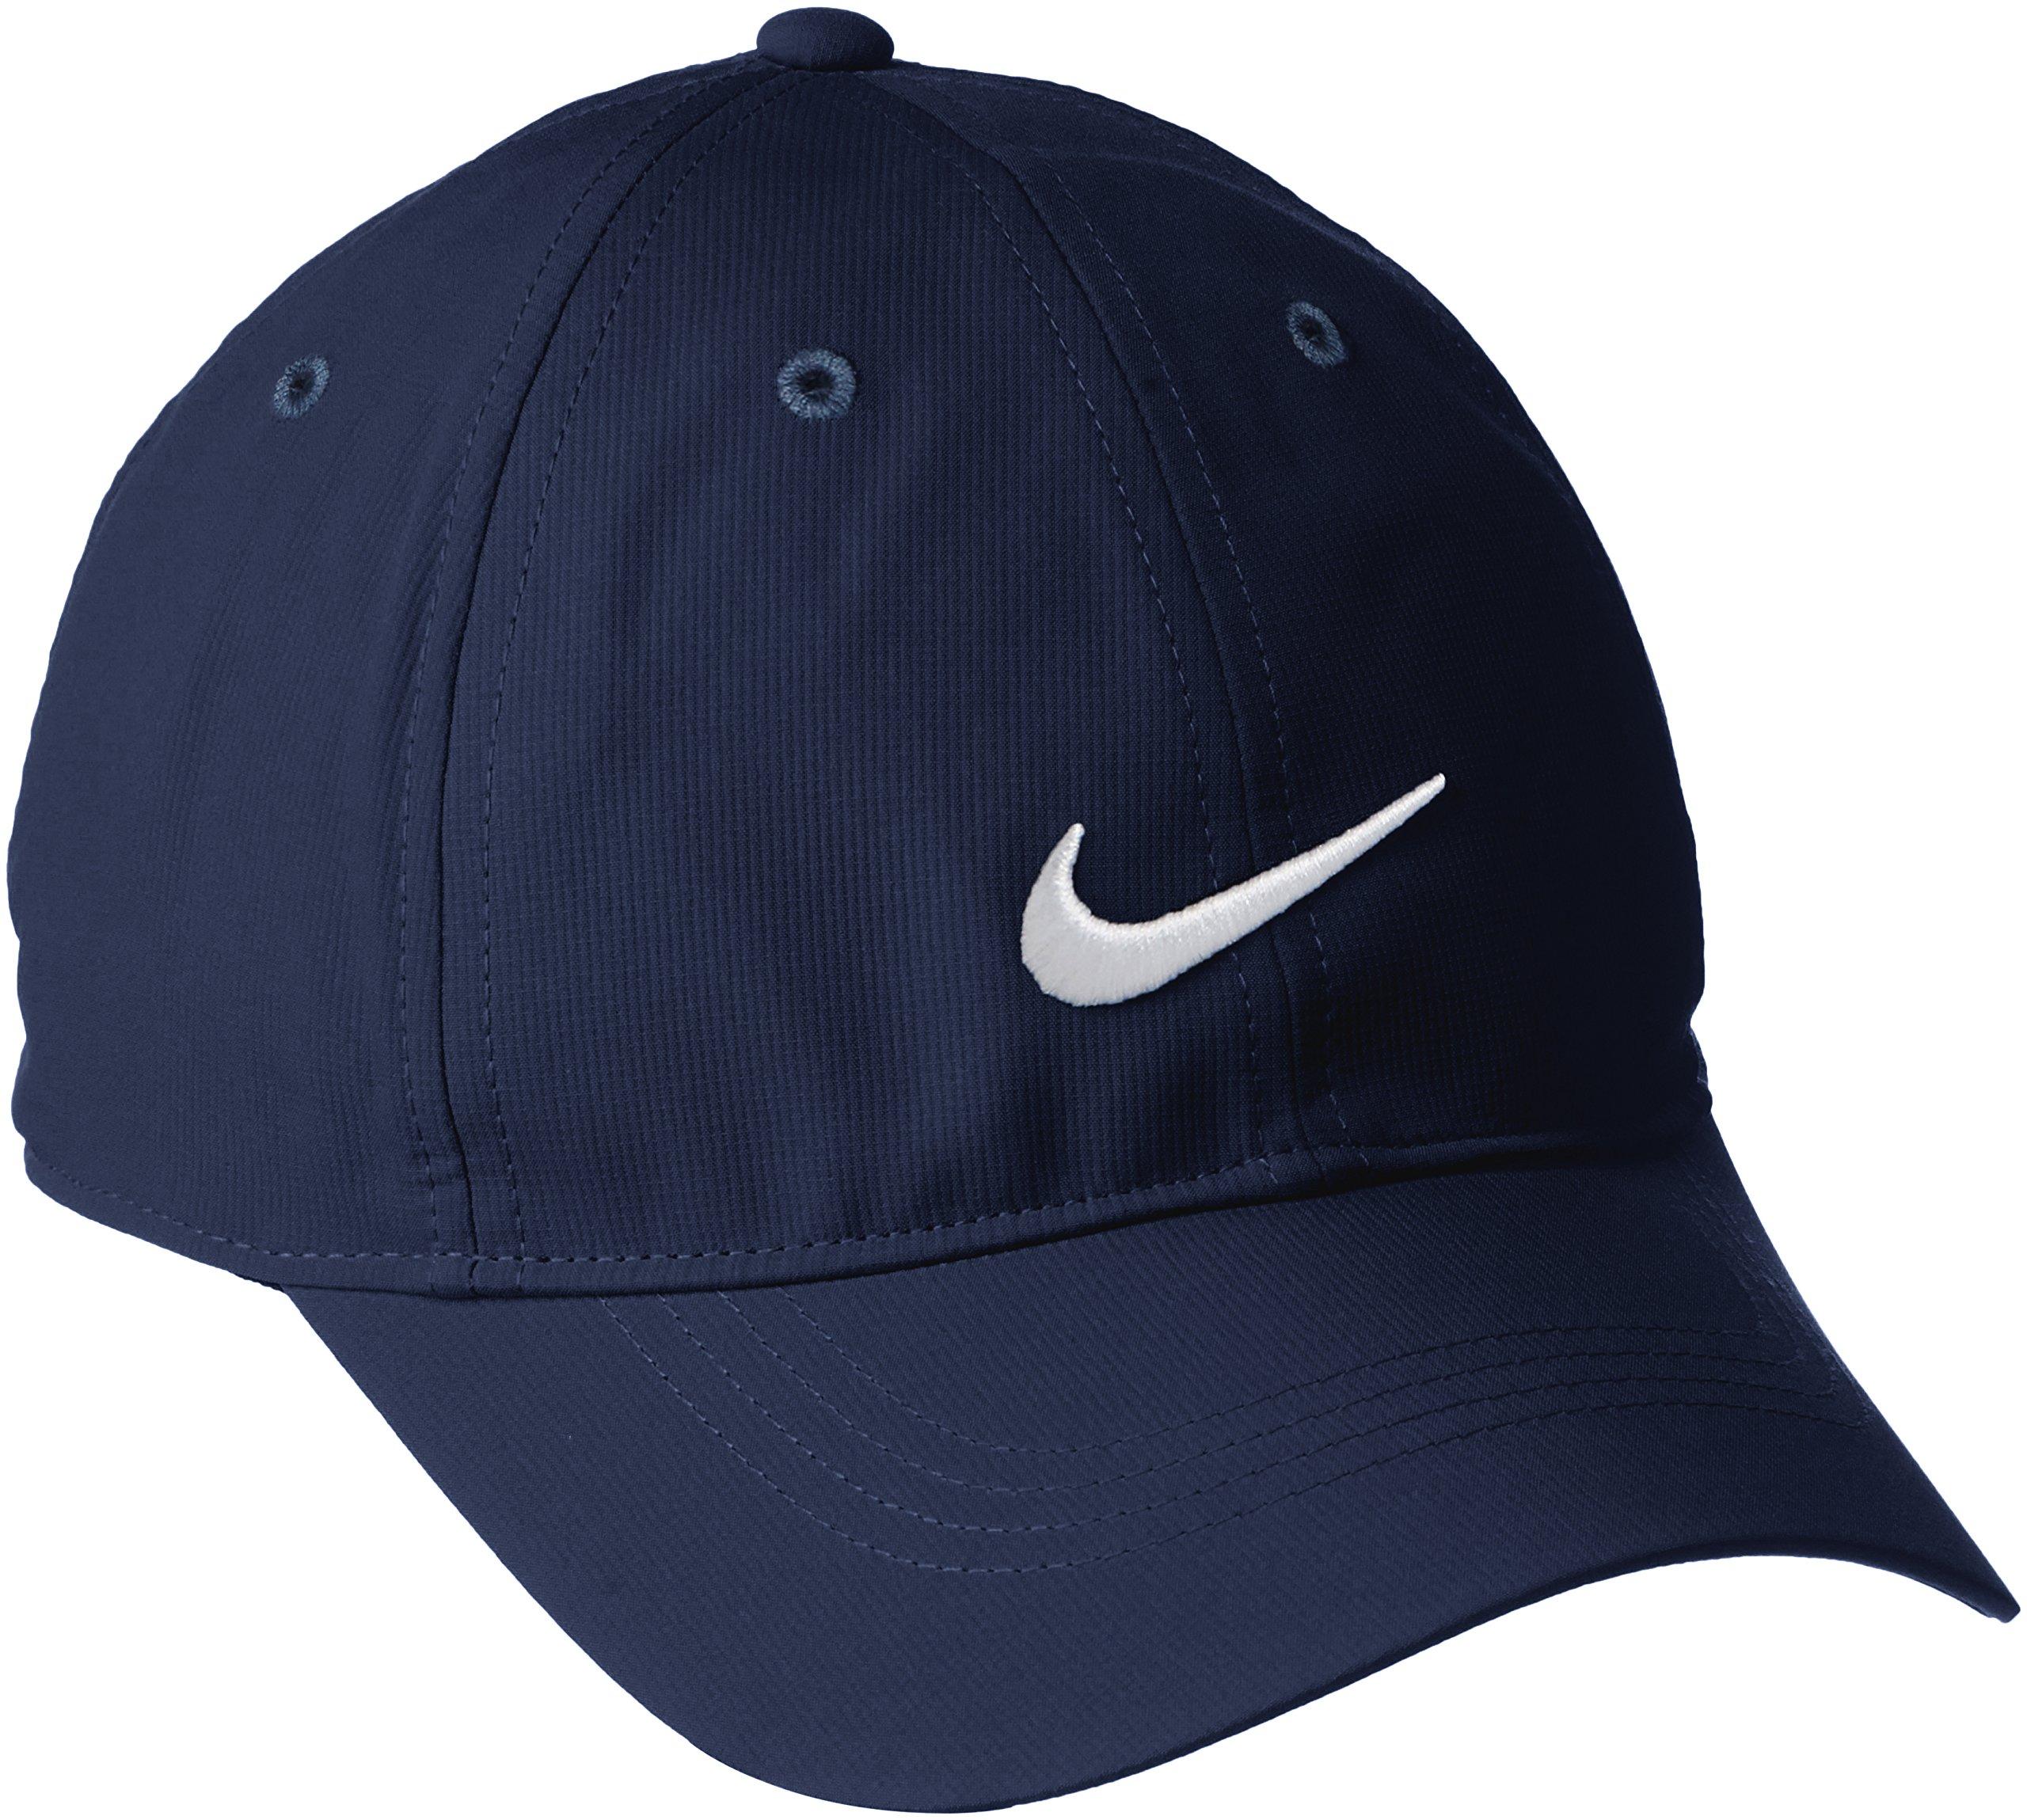 Nike Golf Legacy 91 Tech Cap, Midnight Navy/Black, One Size